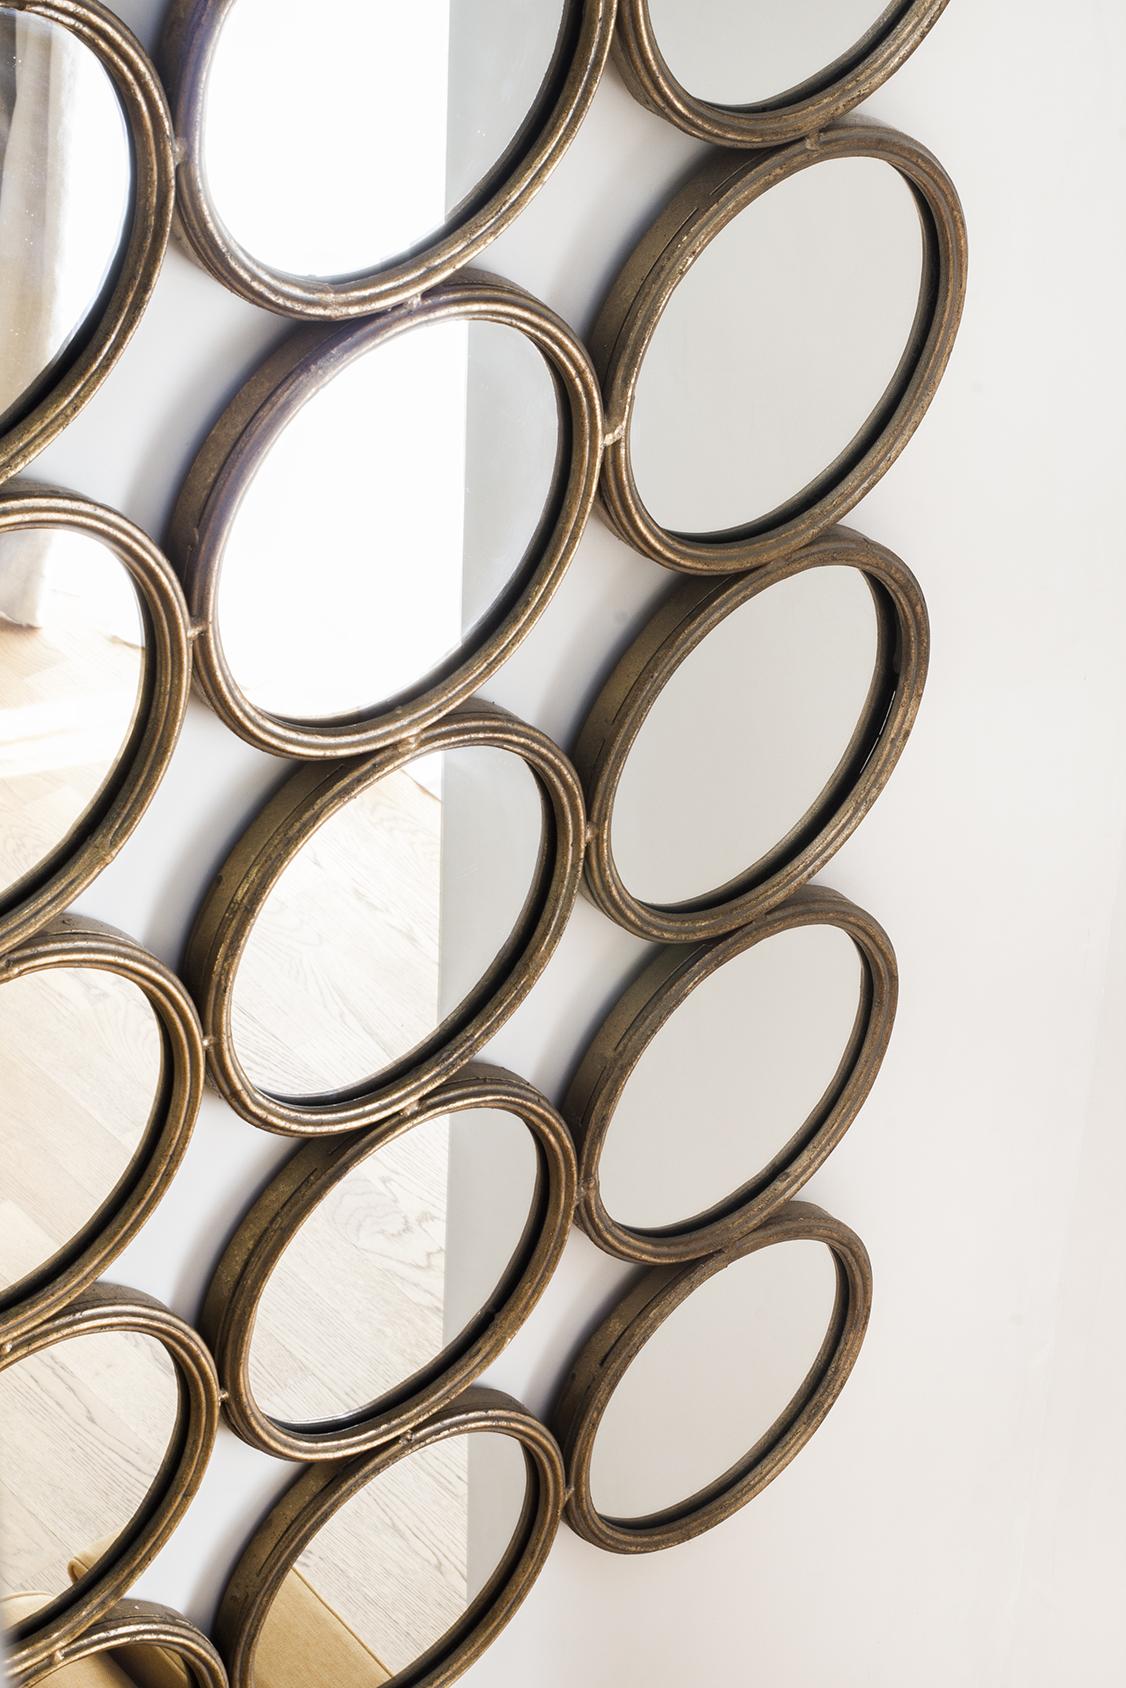 Photo miroirs Hotel Antibes